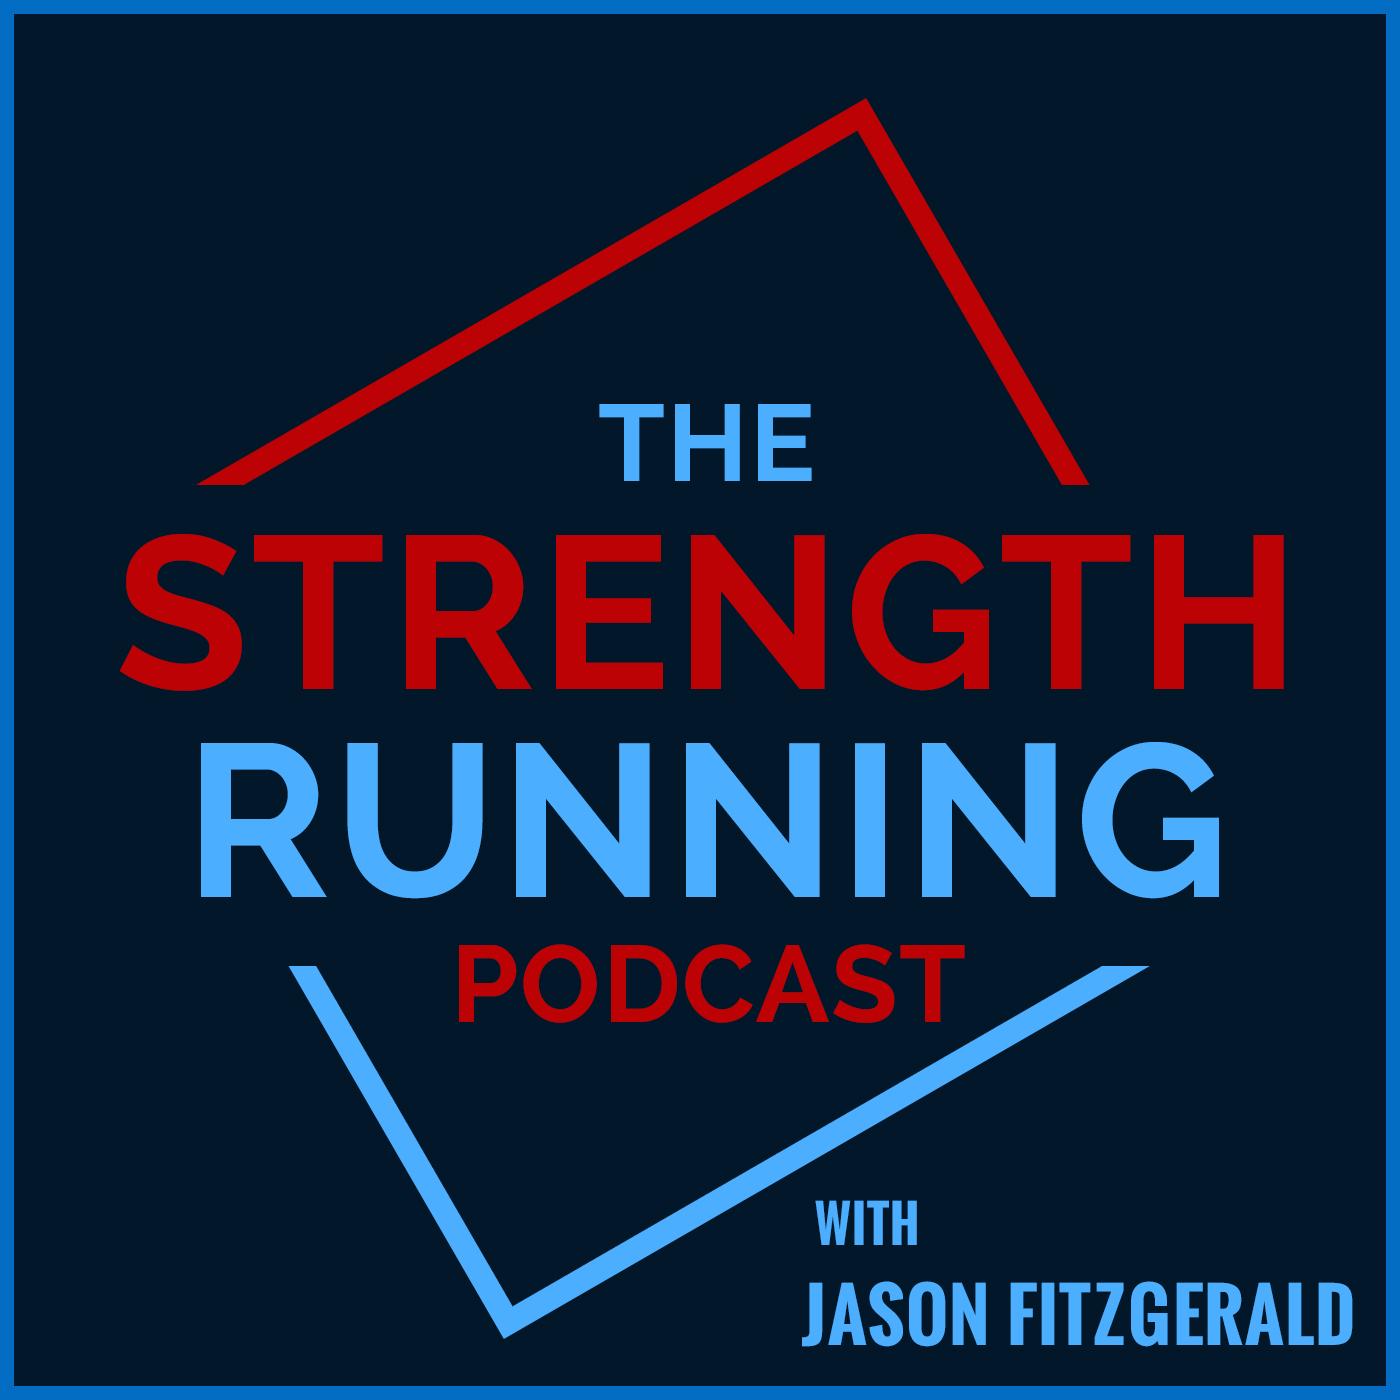 The Strength Running Podcast show art